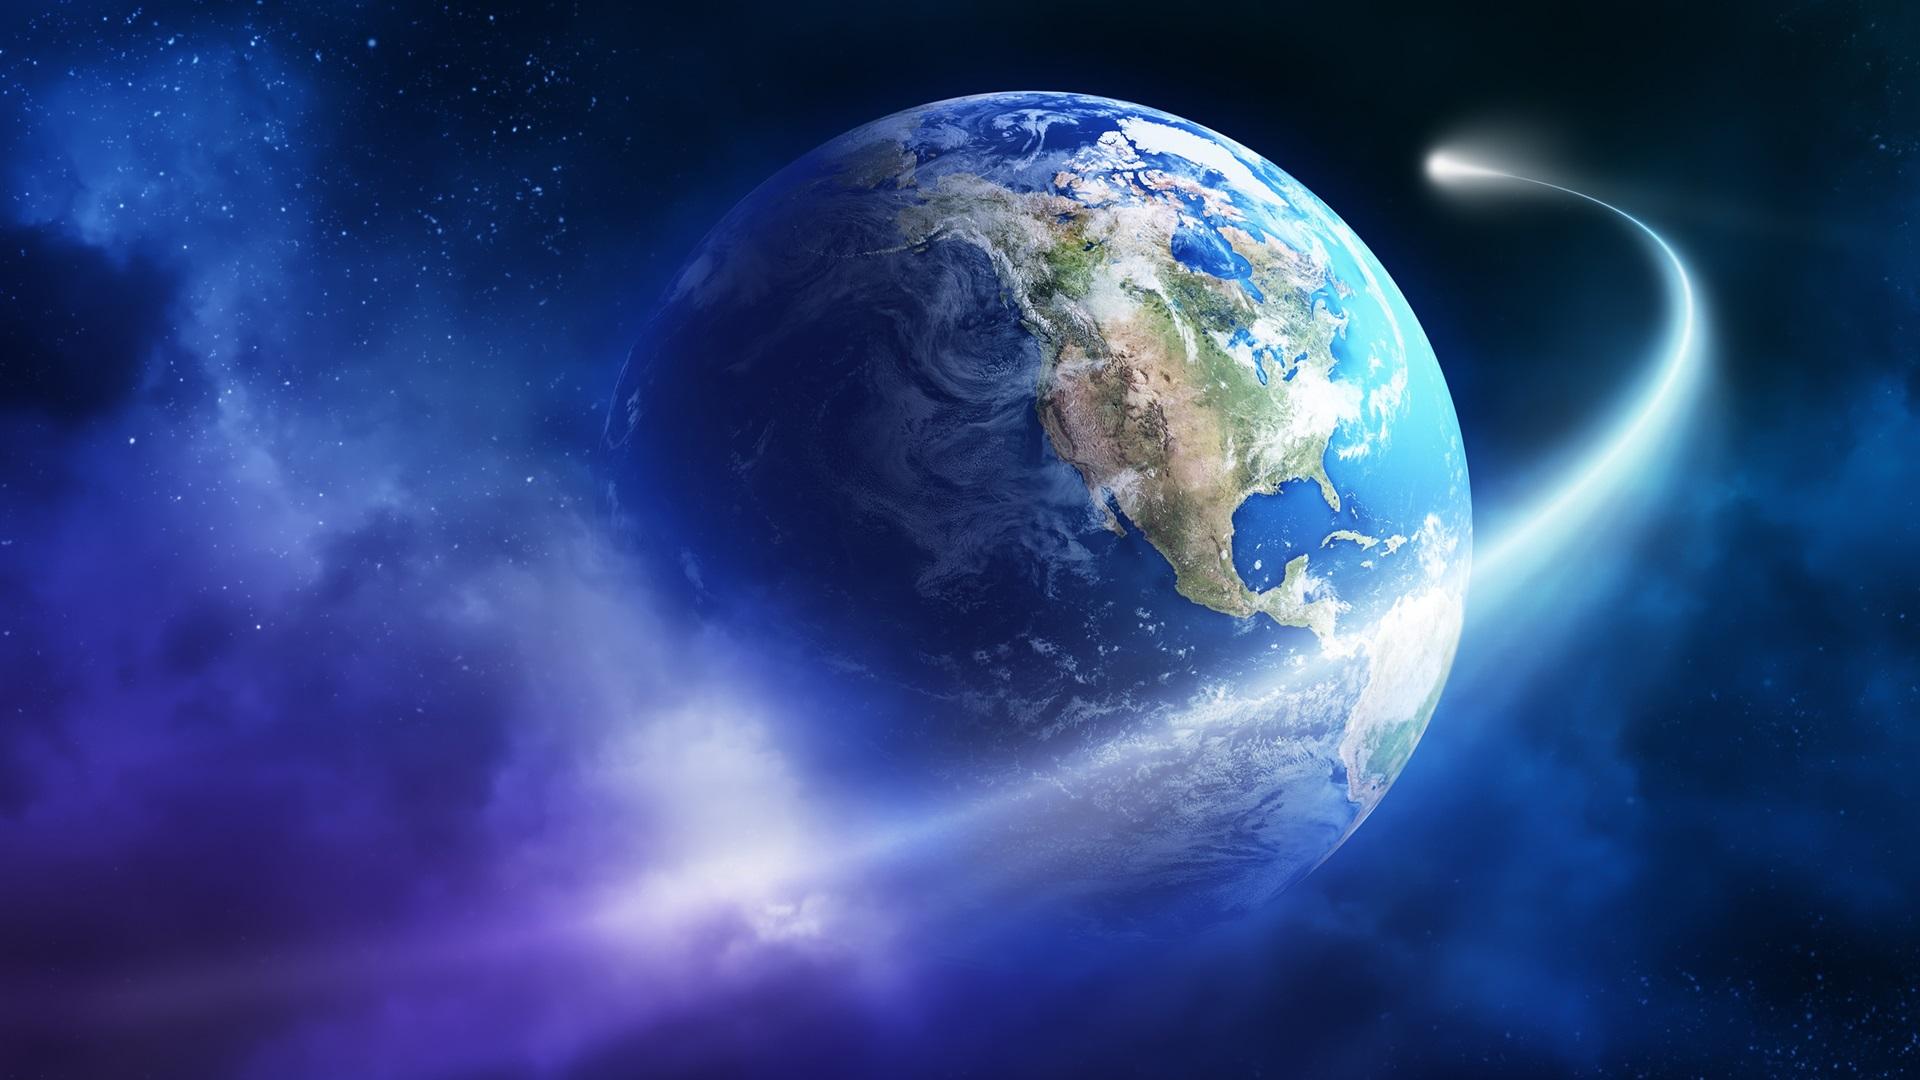 Beautiful Earth, planet, asteroid, comet Wallpaper | 1920x1080 Full HD ...